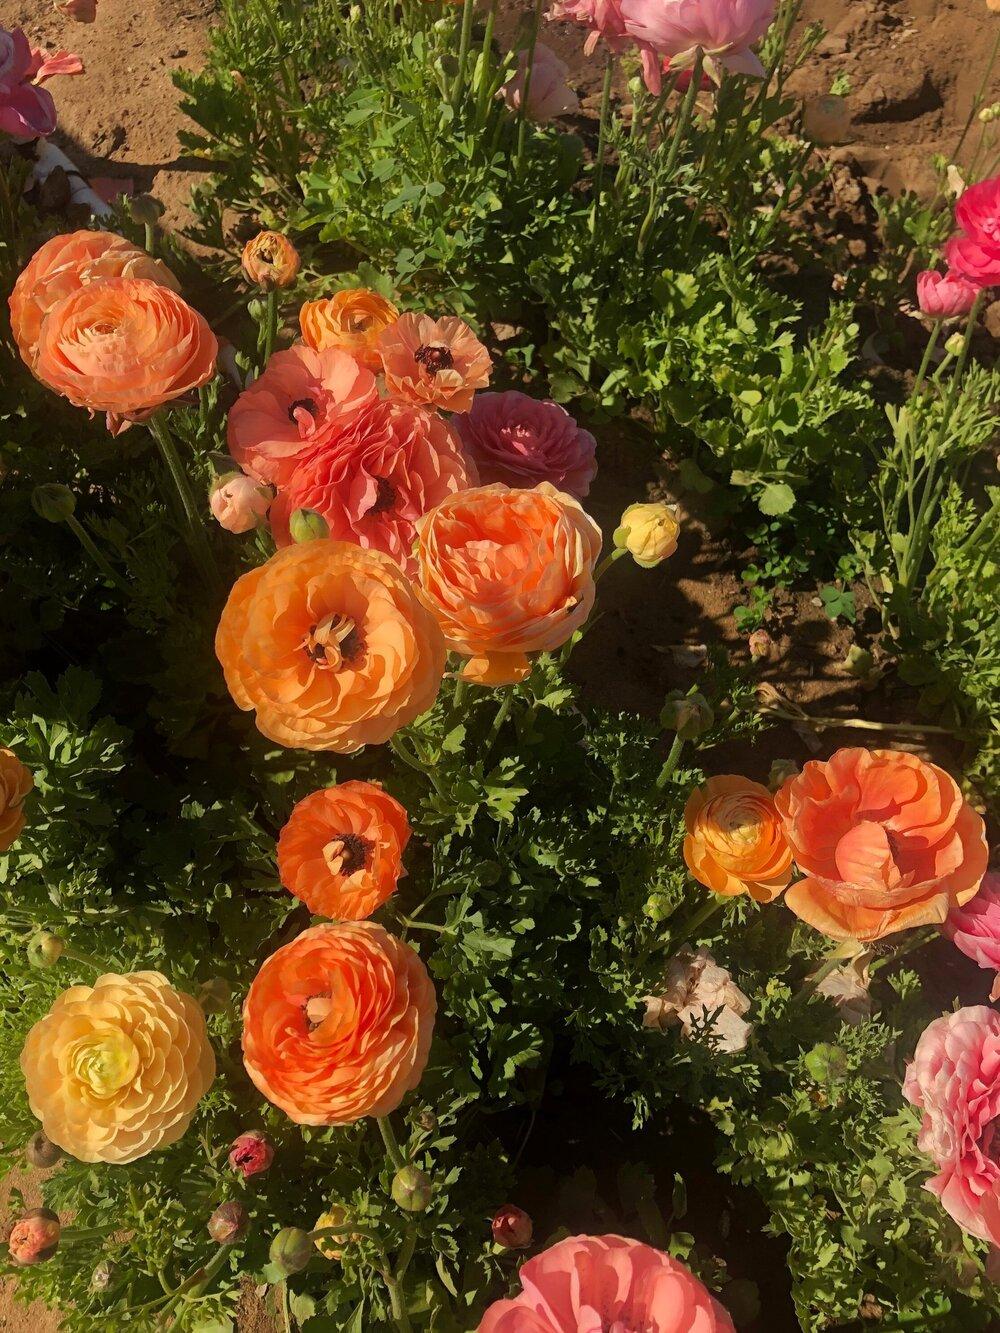 carlsbad_ranch_flower_field_closeup.jpg